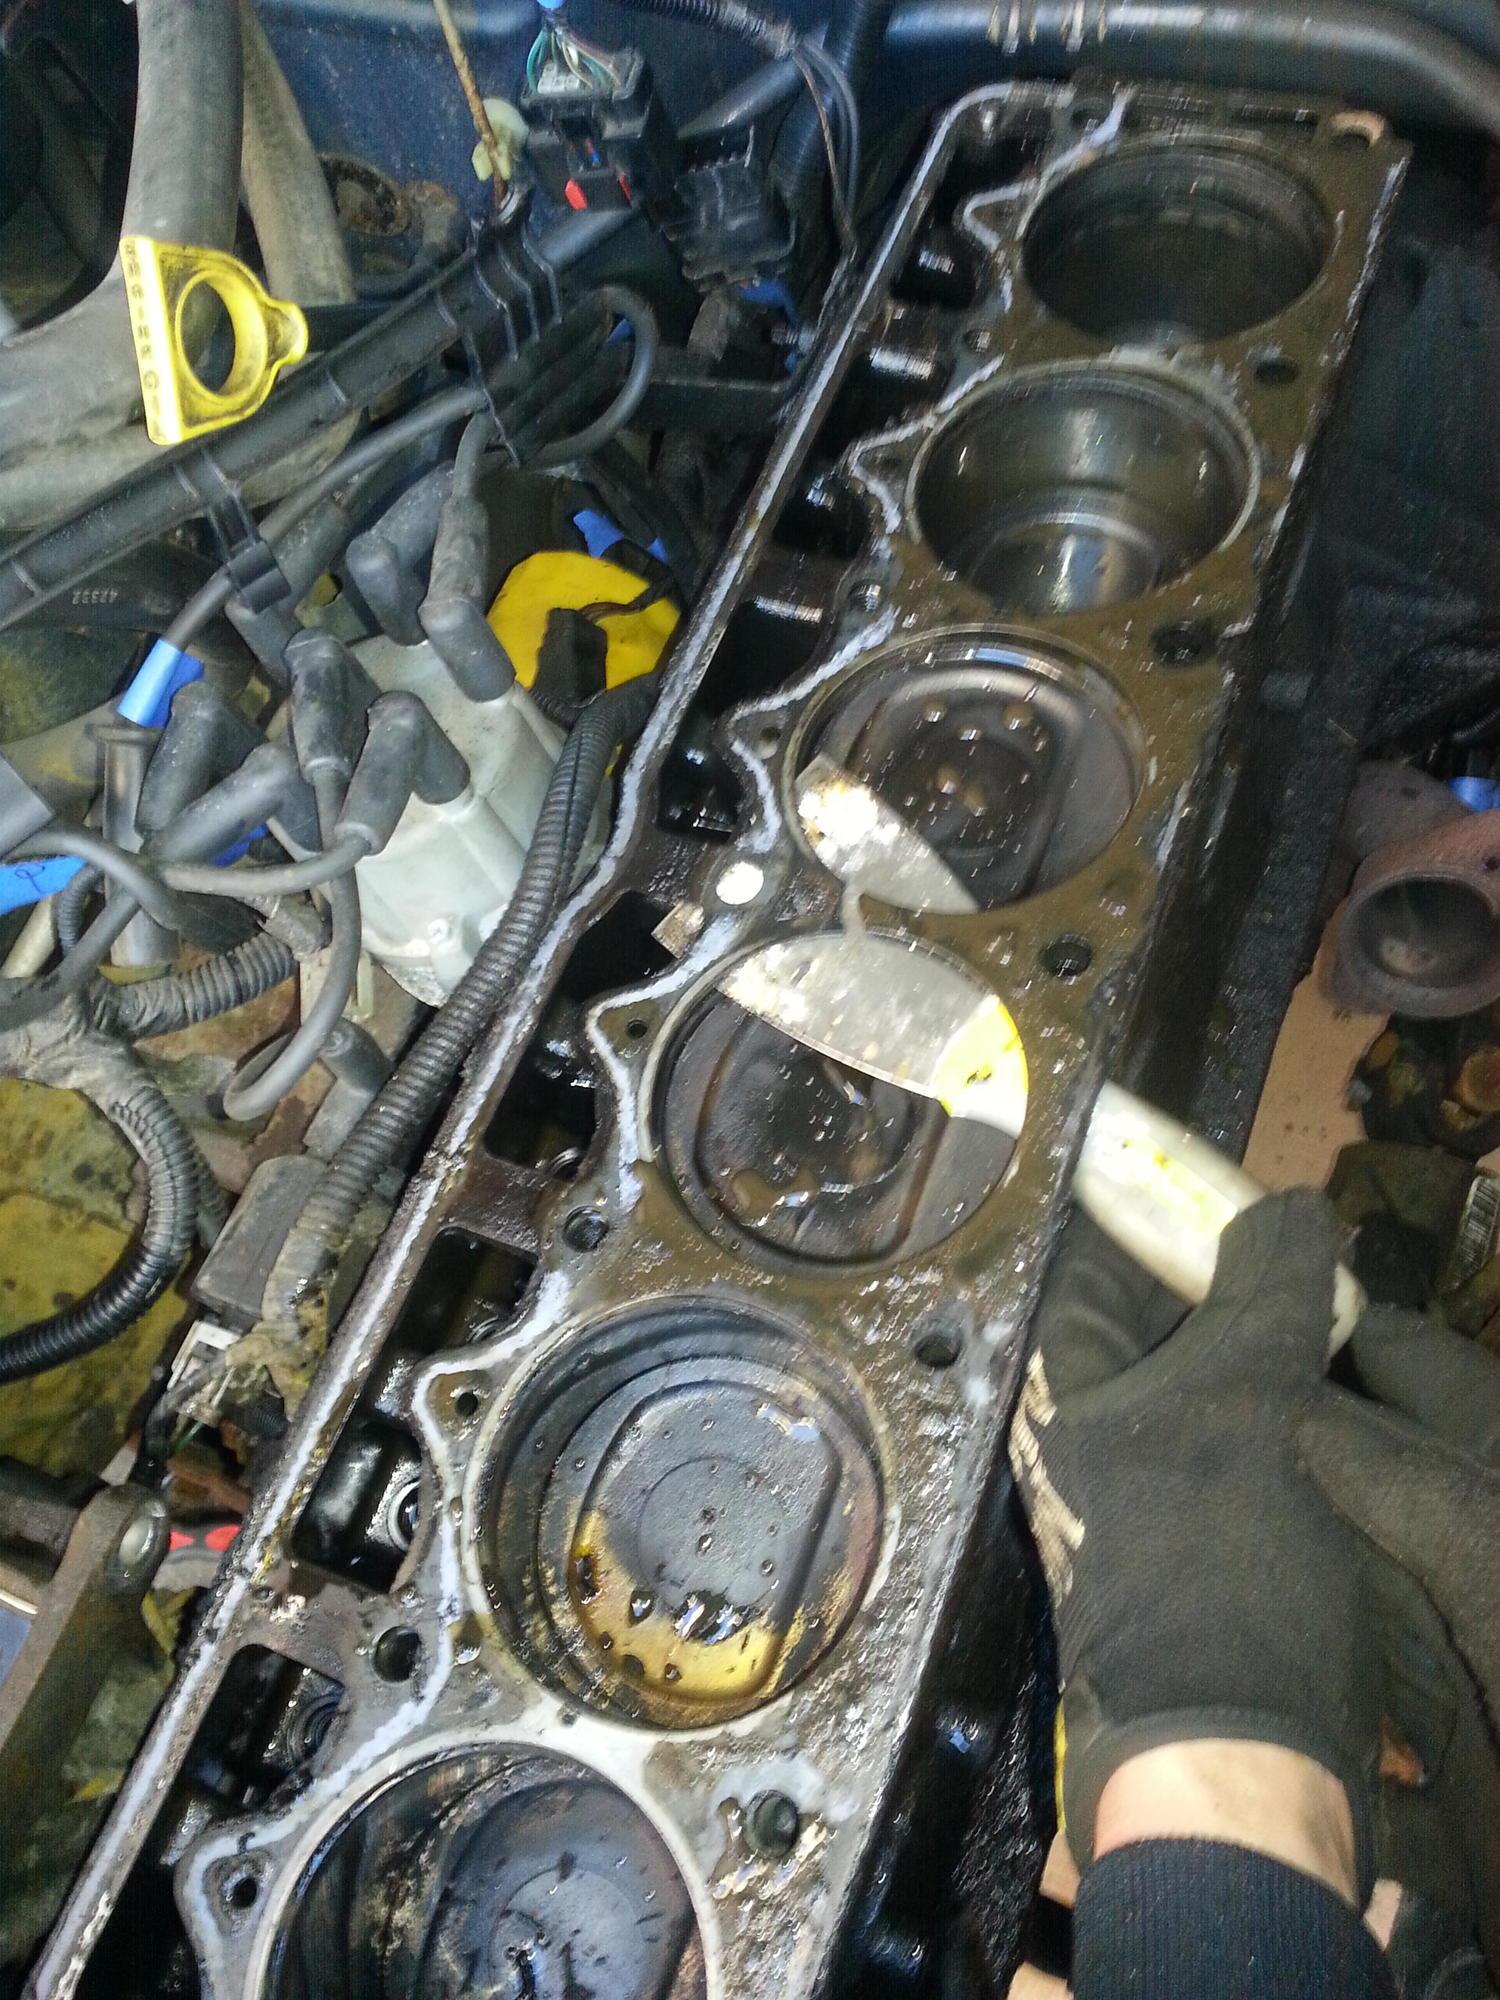 Gasket Fdd Fa Fa A Be E C B on 1995 Jeep Cherokee Head Gasket